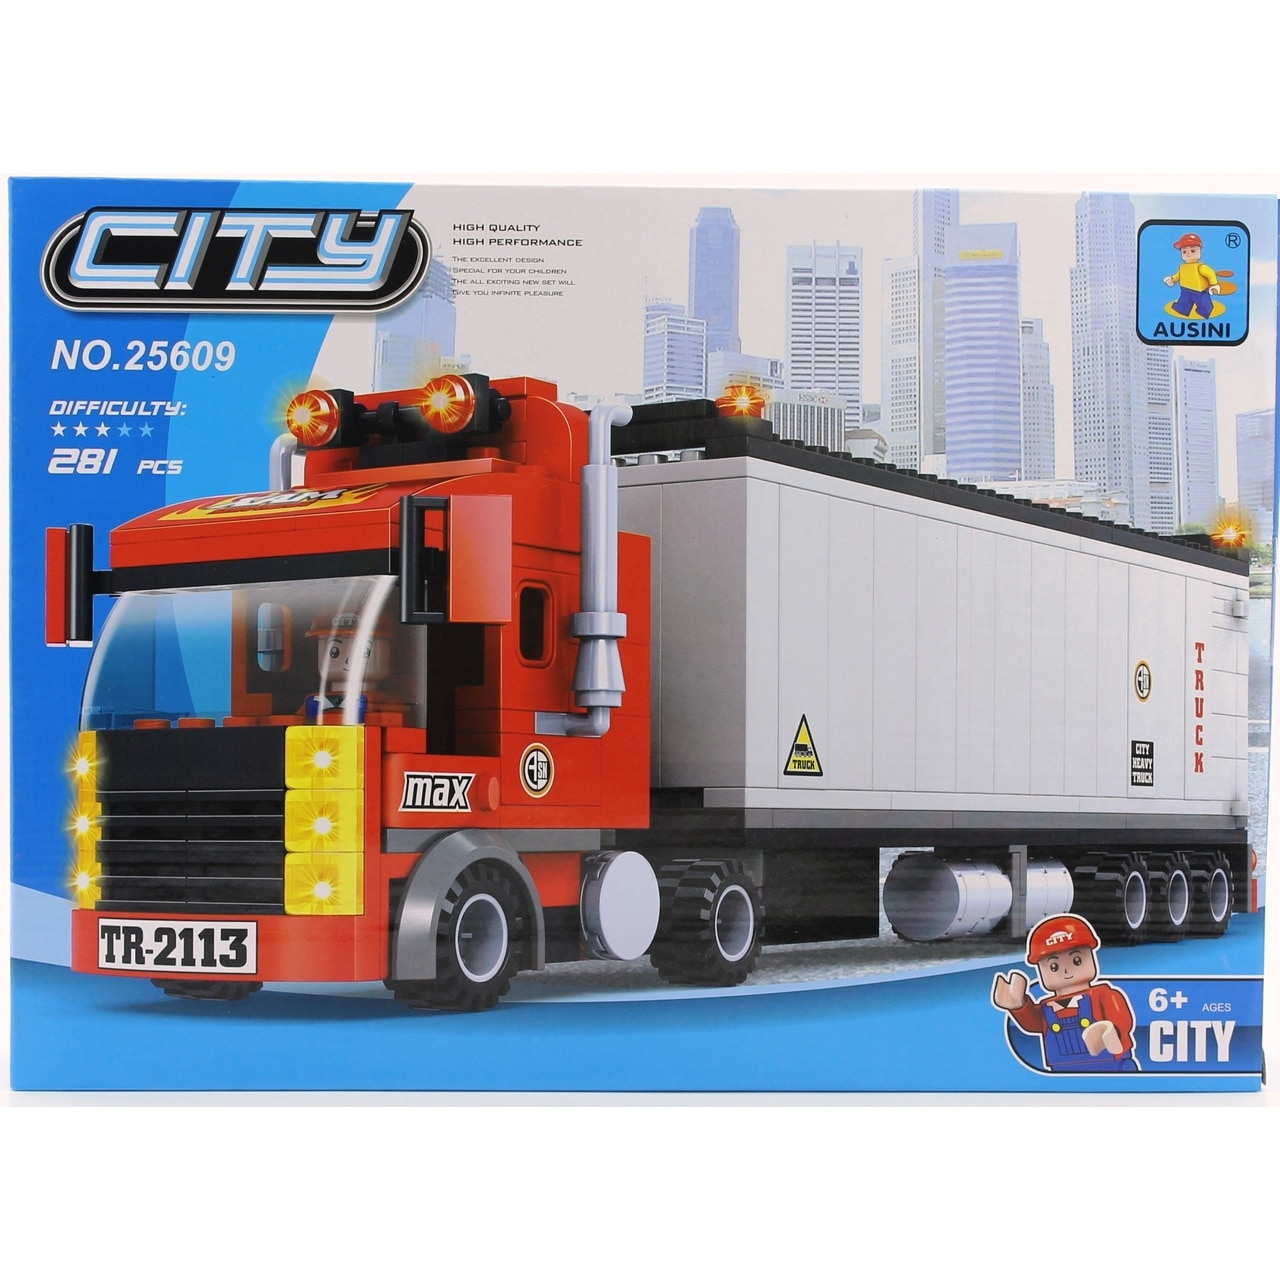 Ausini City contenedor remolque camión Lego Set 281 piezas